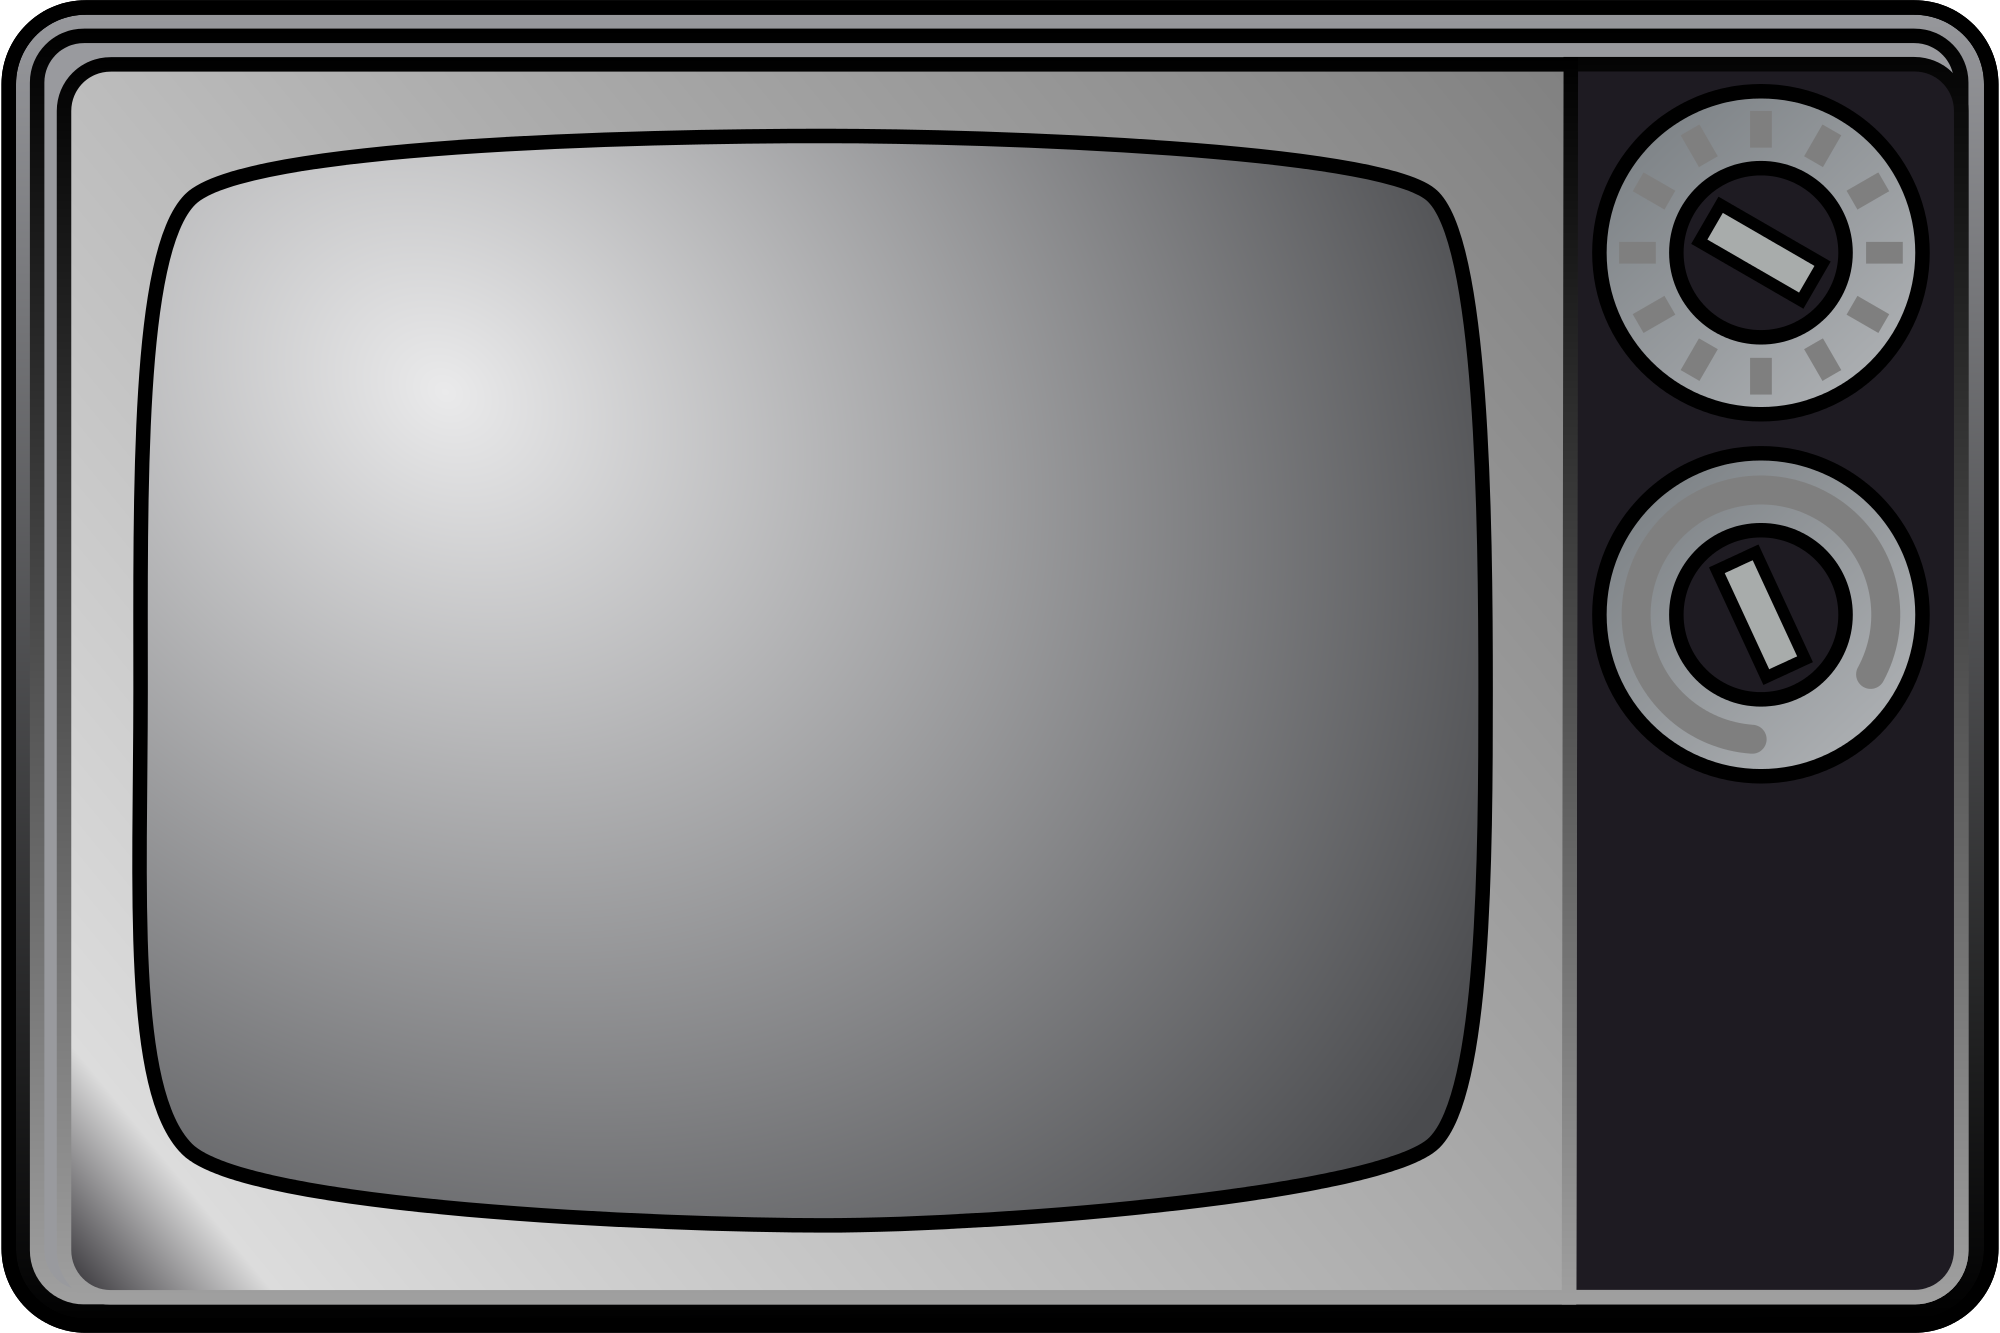 PNG Television Set - 57566